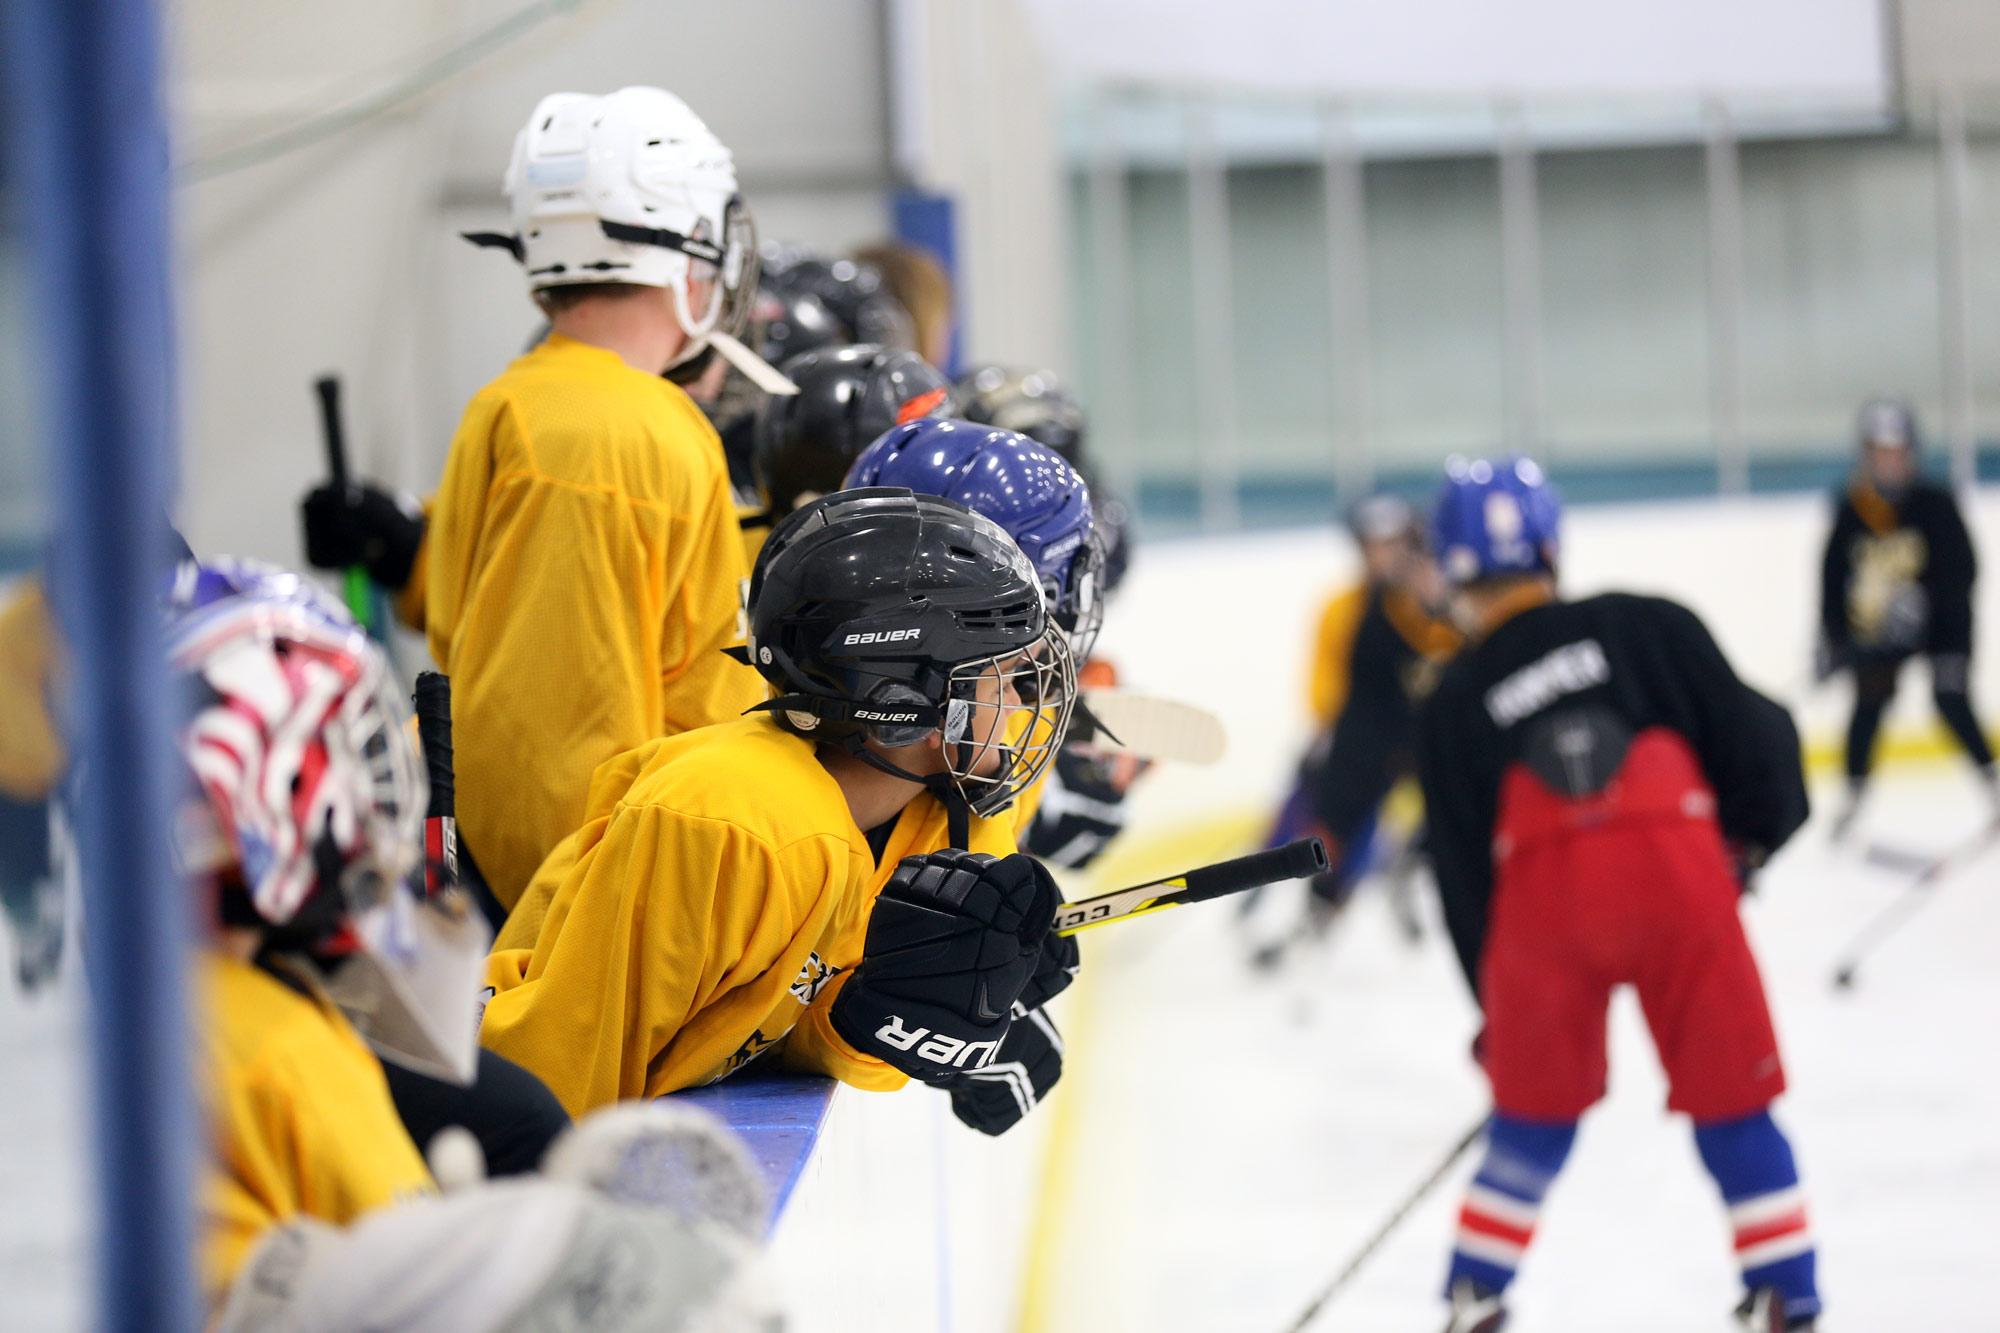 hockey-players-on-ice.jpg